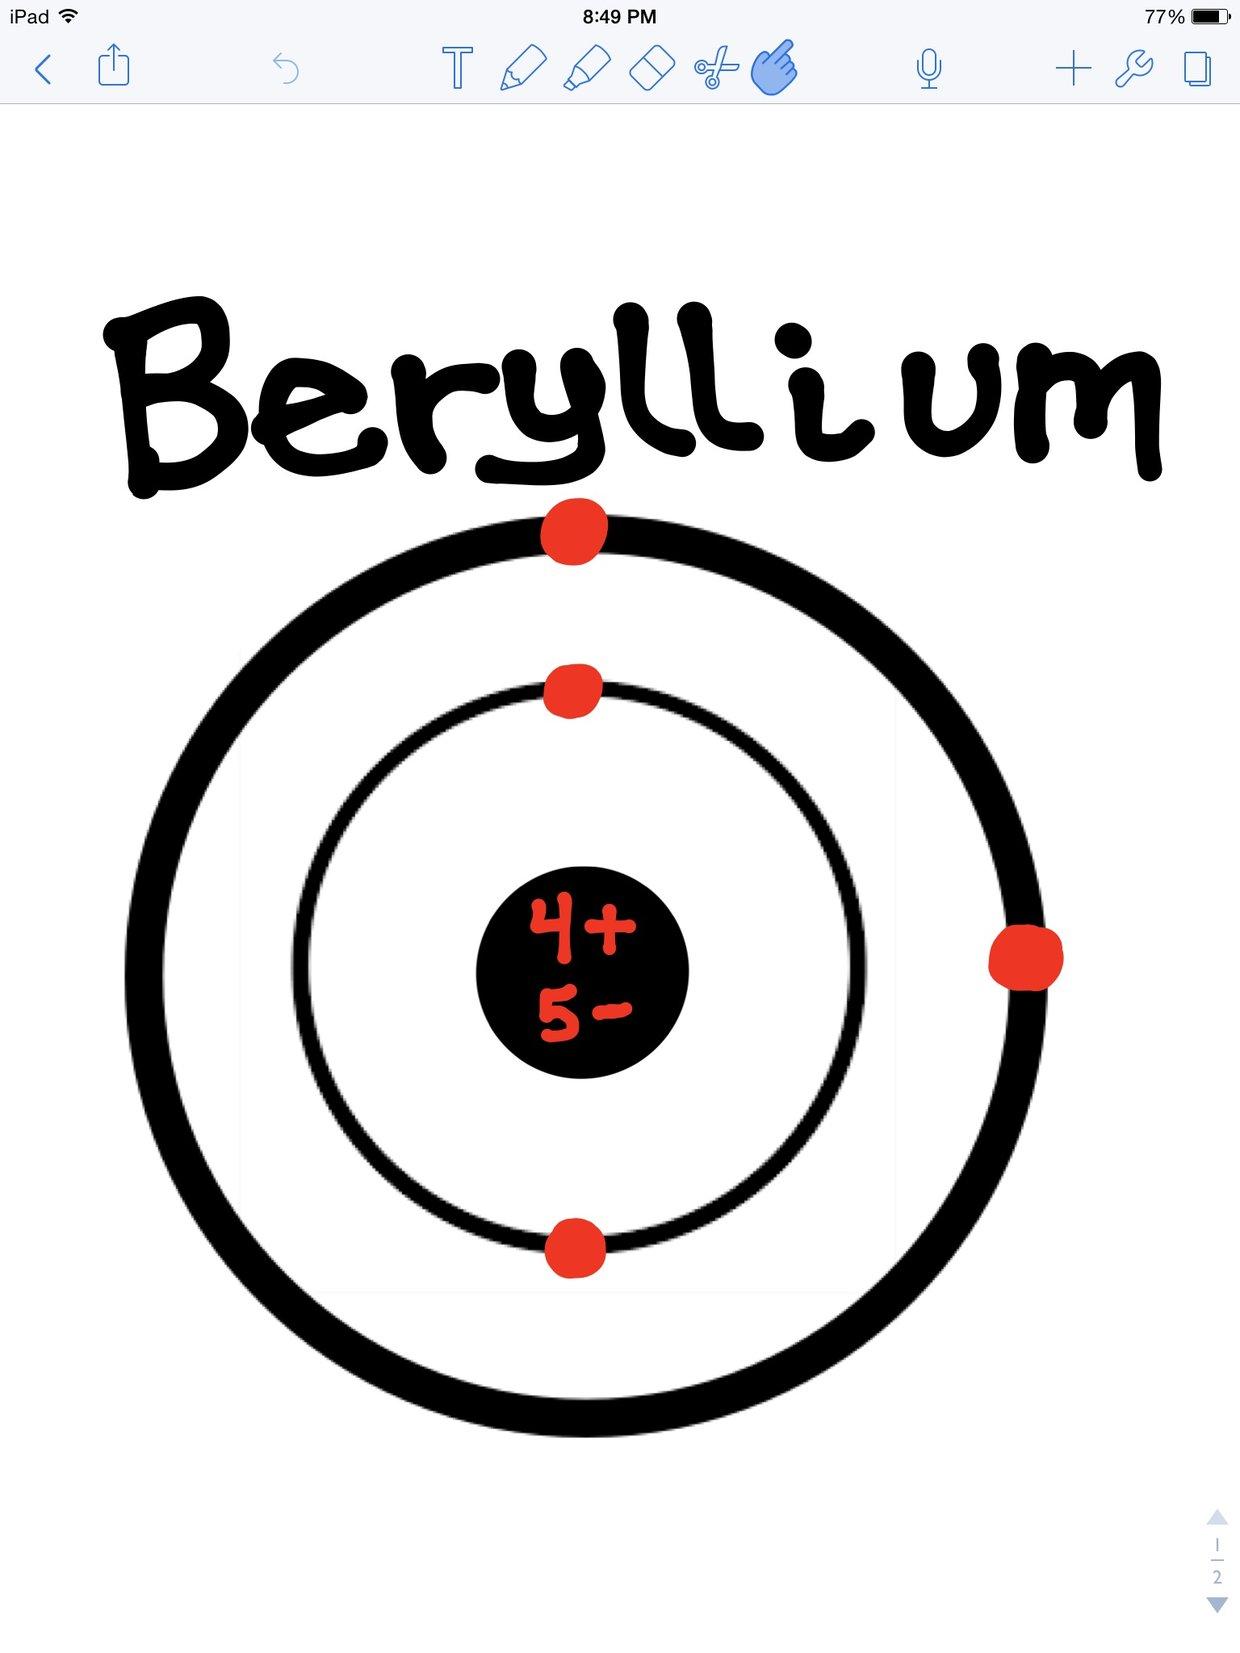 Beryllium bohr model thinglink beryllium bohr model ccuart Choice Image